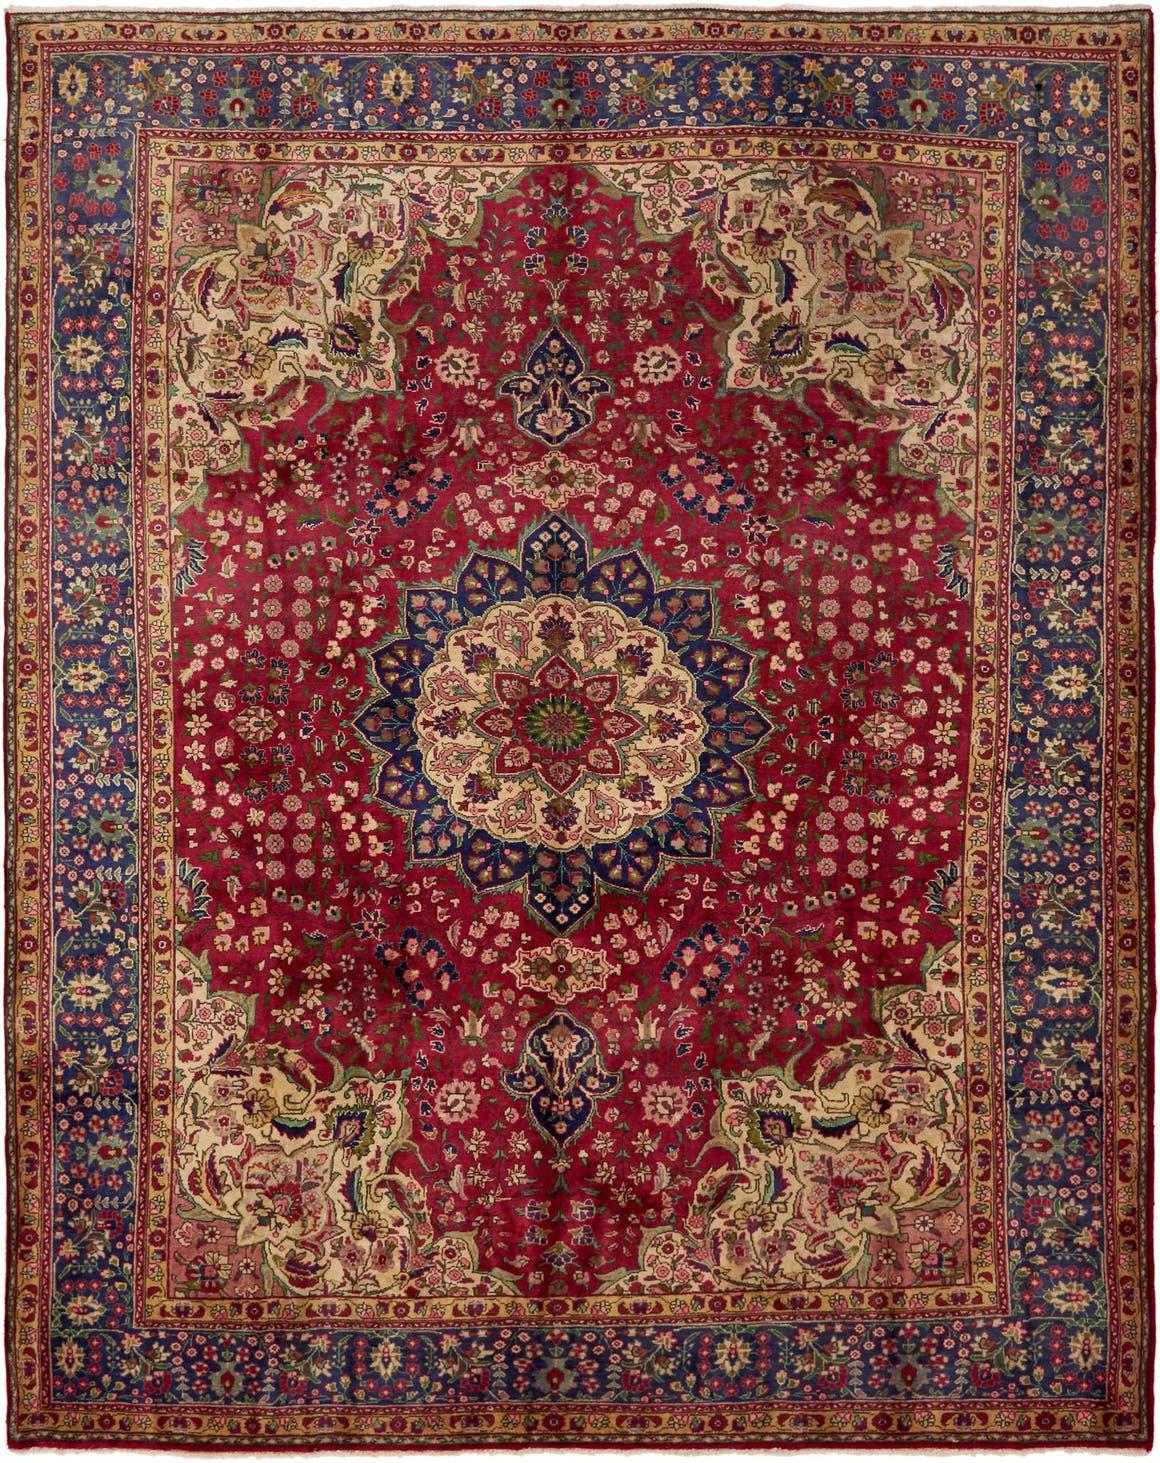 10' x 12' 4 Tabriz Persian Rug main image